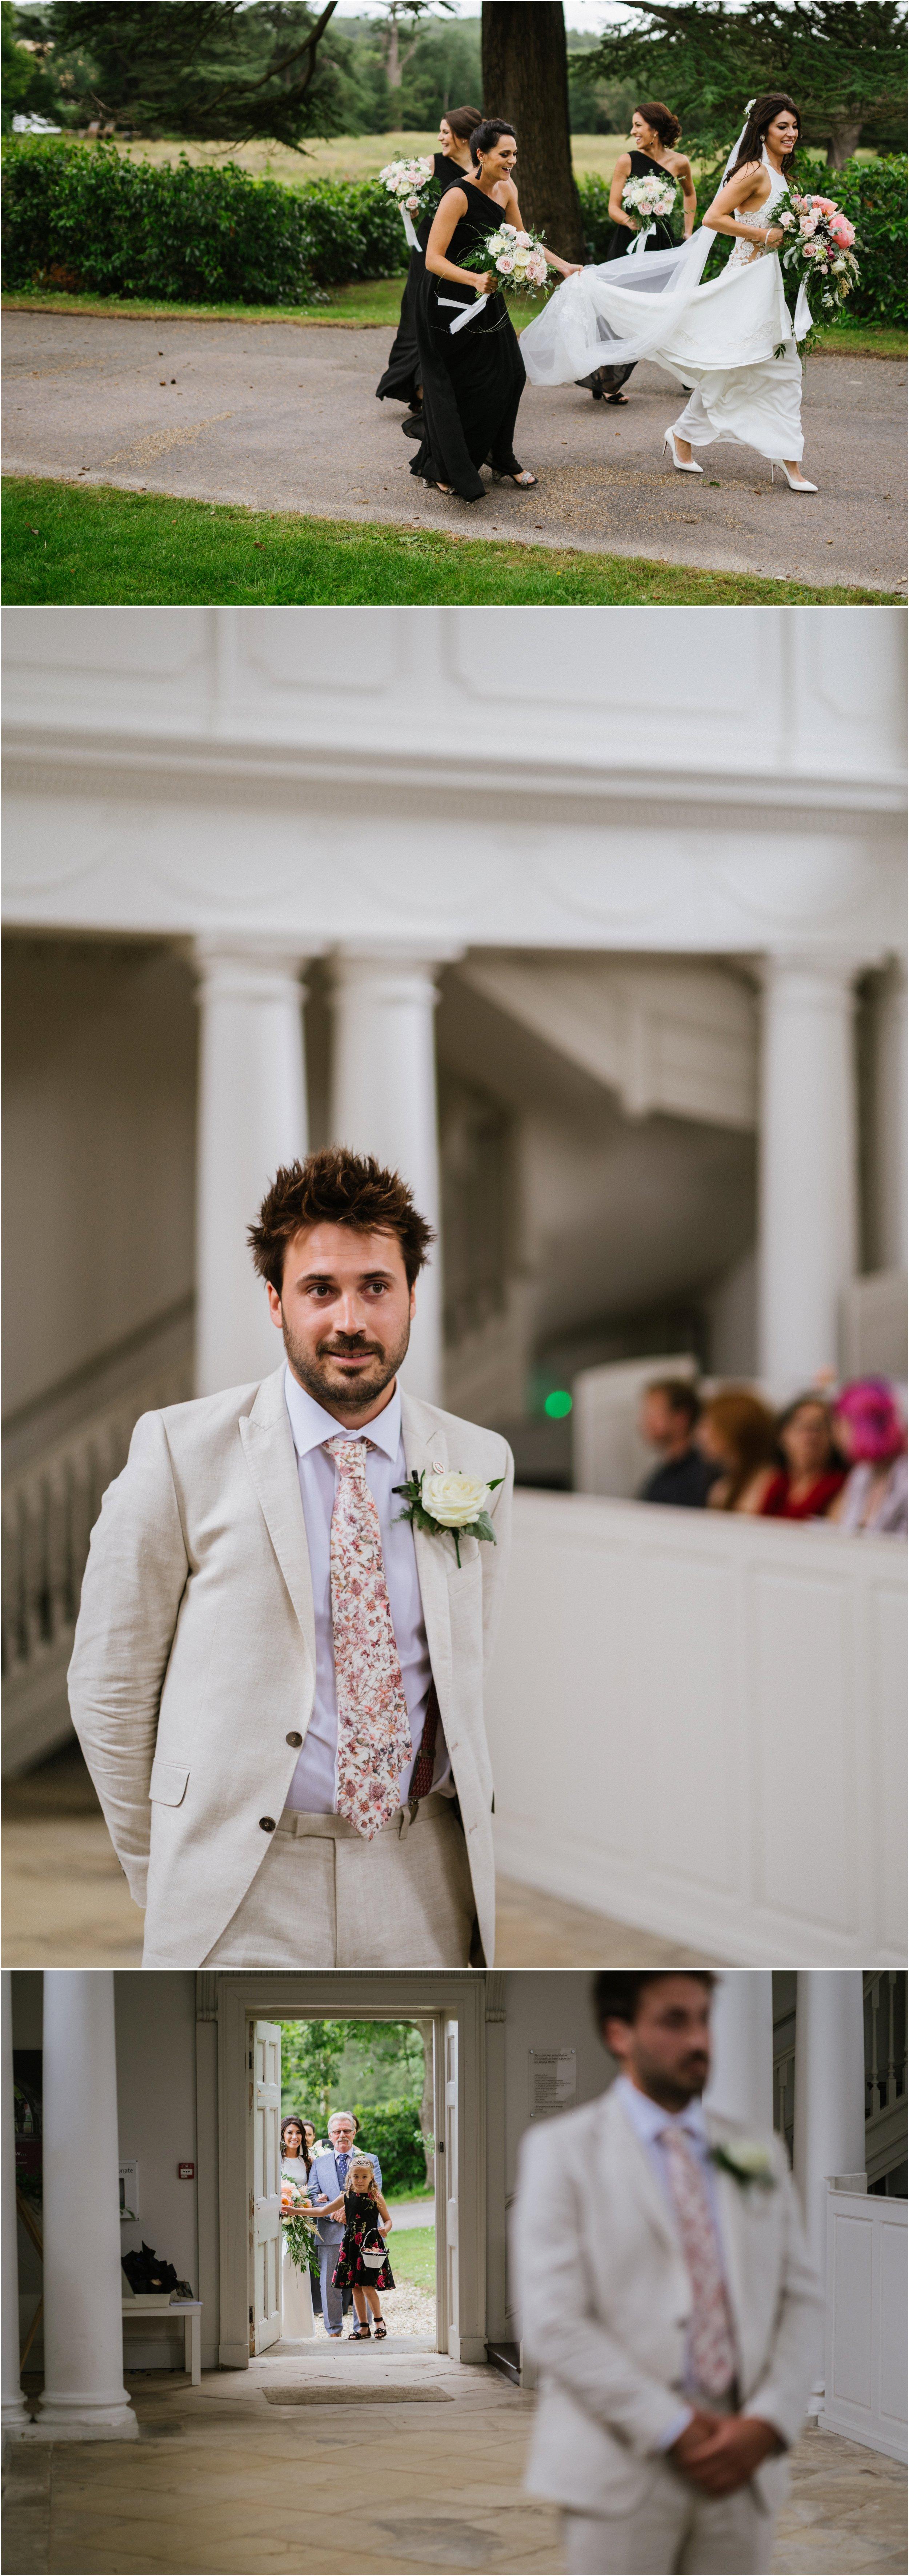 Compton Verney wedding photography_0052.jpg